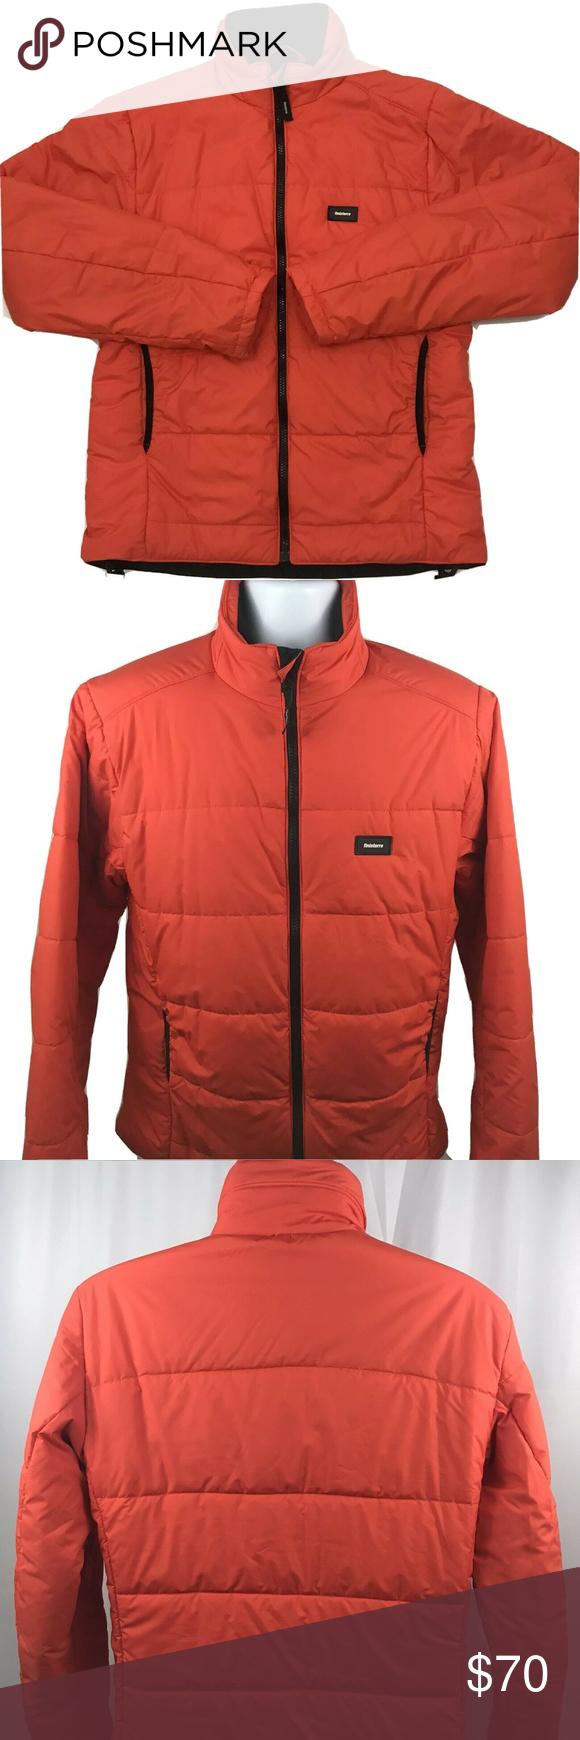 Finisterre Mens Puffer Jacket Primaloft Insulated Mens Puffer Jacket Jackets Men Fashion Jackets [ 1740 x 580 Pixel ]